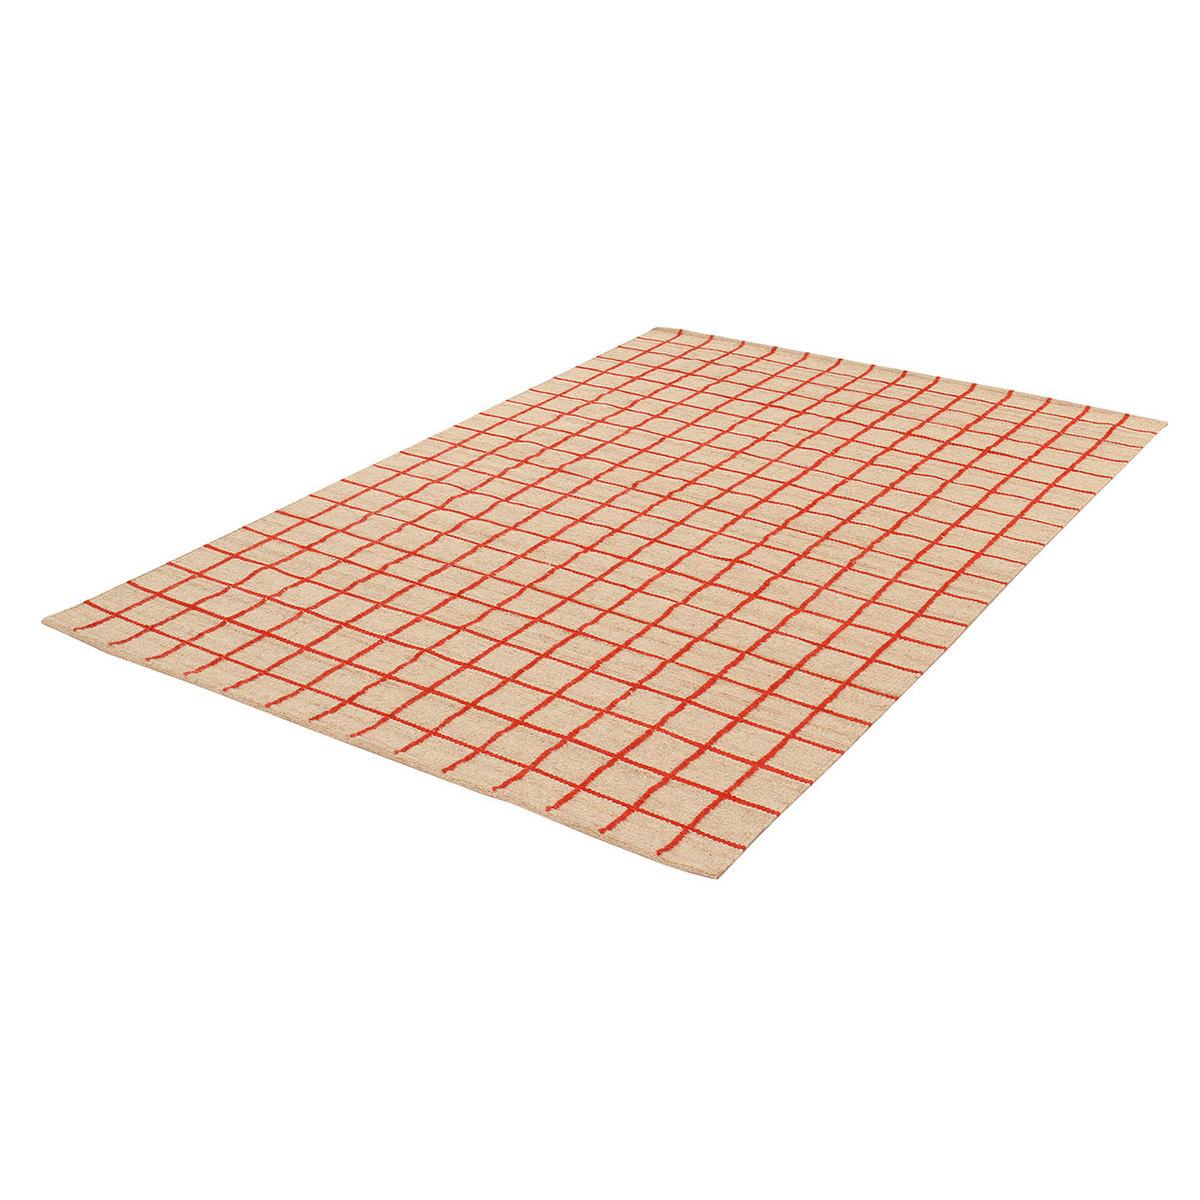 Kilim box alfombra 200x300 cm by jalal lovethesign - Alfombra 200x300 ...